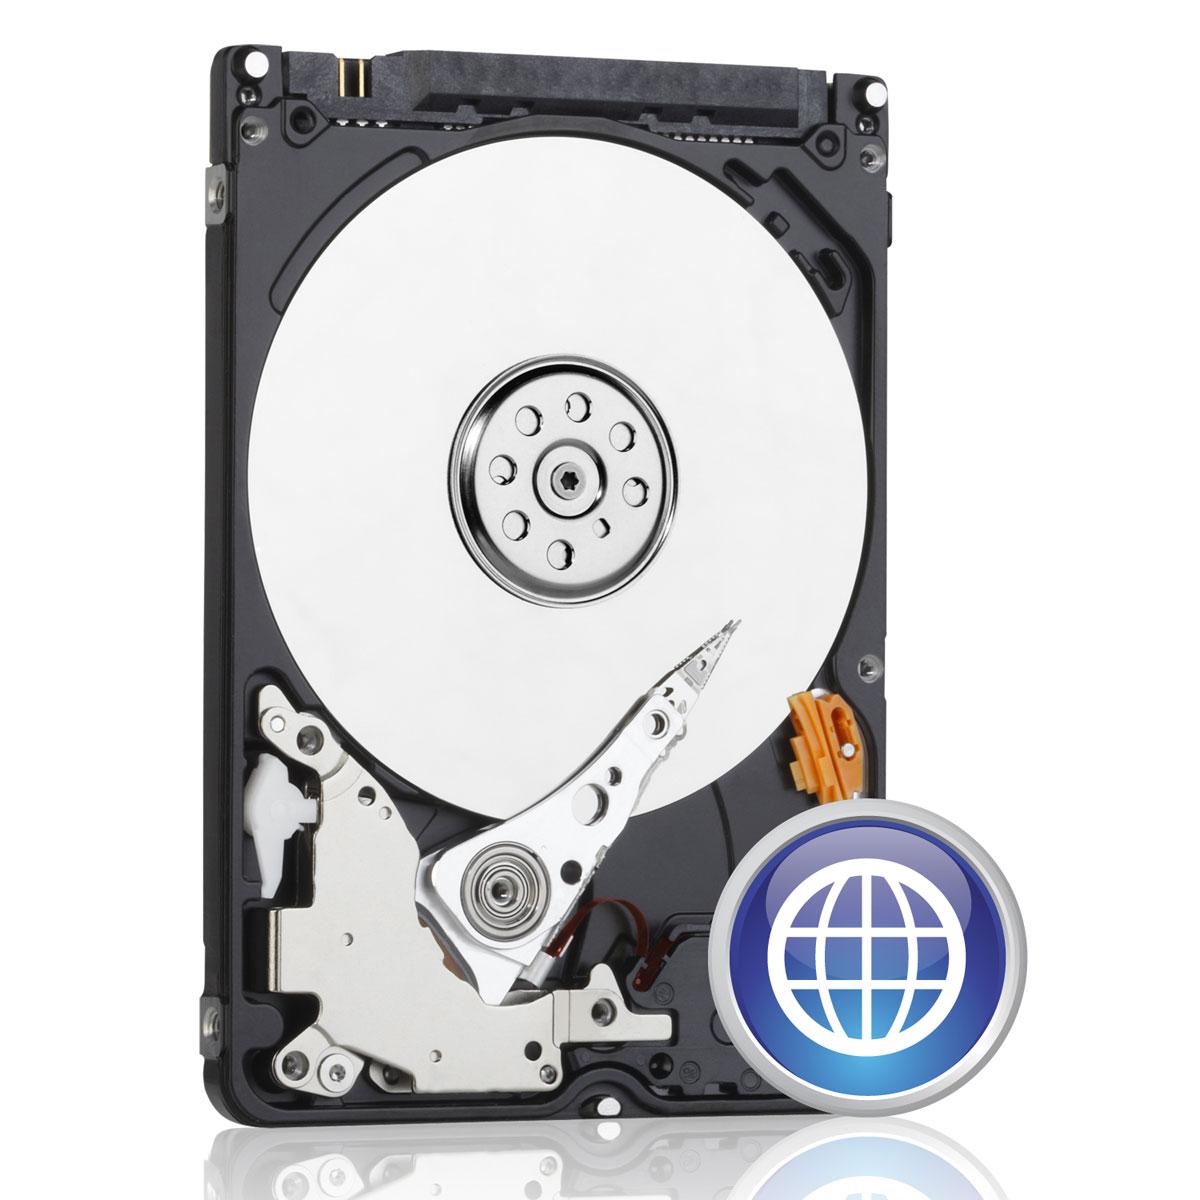 "Disque dur interne WD Blue Mobile 750 Go 7 mm Disque dur 2.5"" 750 Go 7 mm 5400 RPM 8 Mo Serial ATA III 6 Gb/s (bulk)"